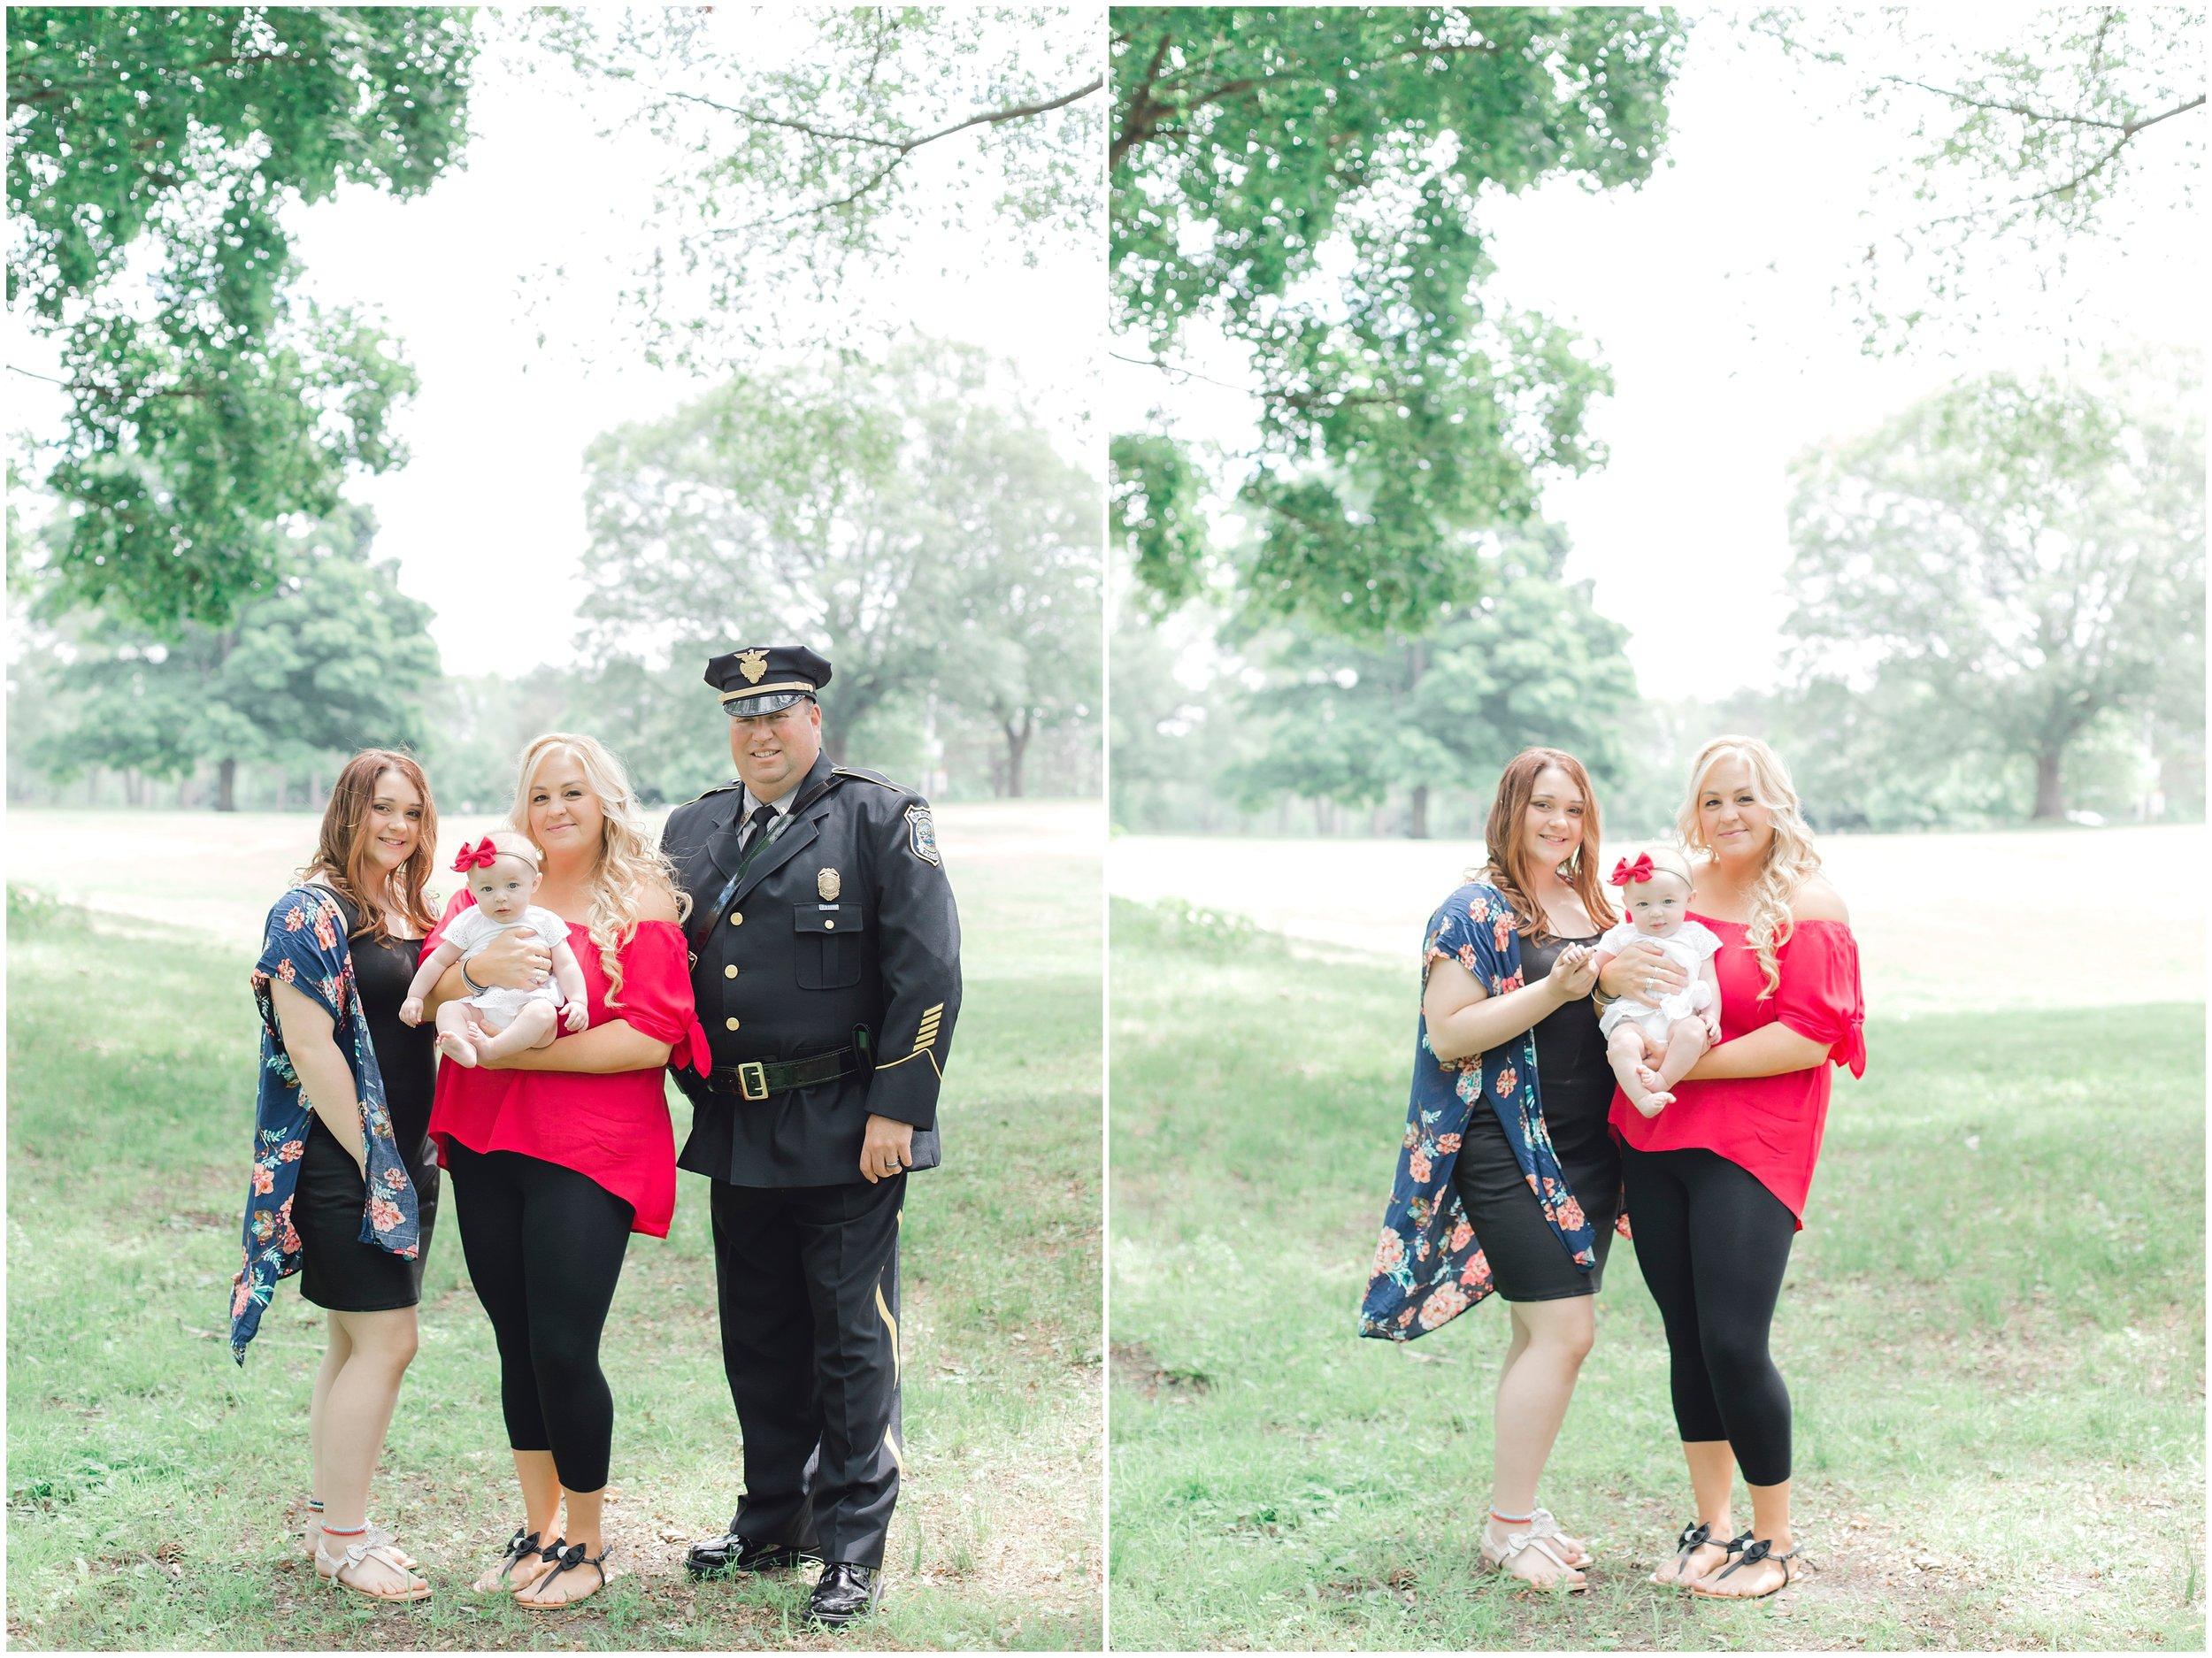 Public_safety_family_photos_framingham_erica_pezente_photography (5).jpg